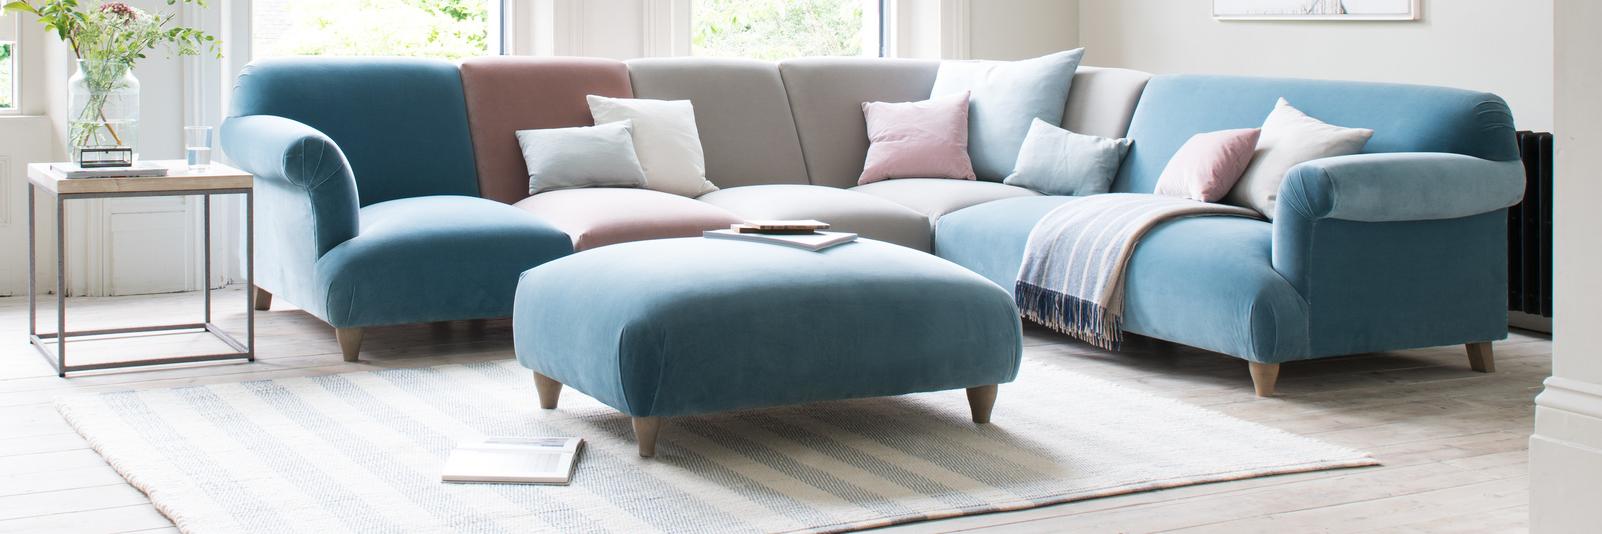 Sofa Modular Jxdu Modular sofas Clever Sectional sofas Loaf